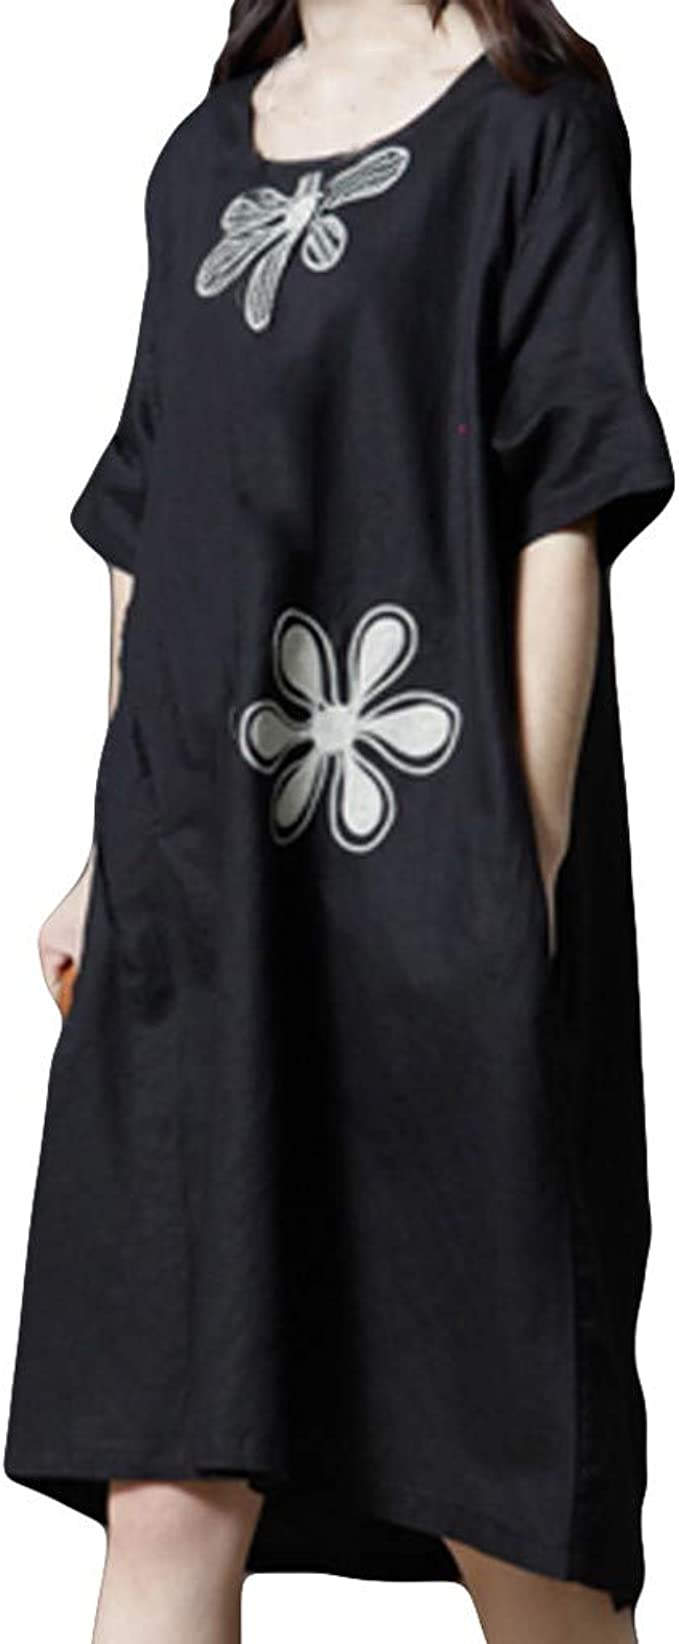 Suma-ma Womens O-Neck Dots Printed Dresses Fashion Casual Long Sleeve Pockets Party Dress With Belt